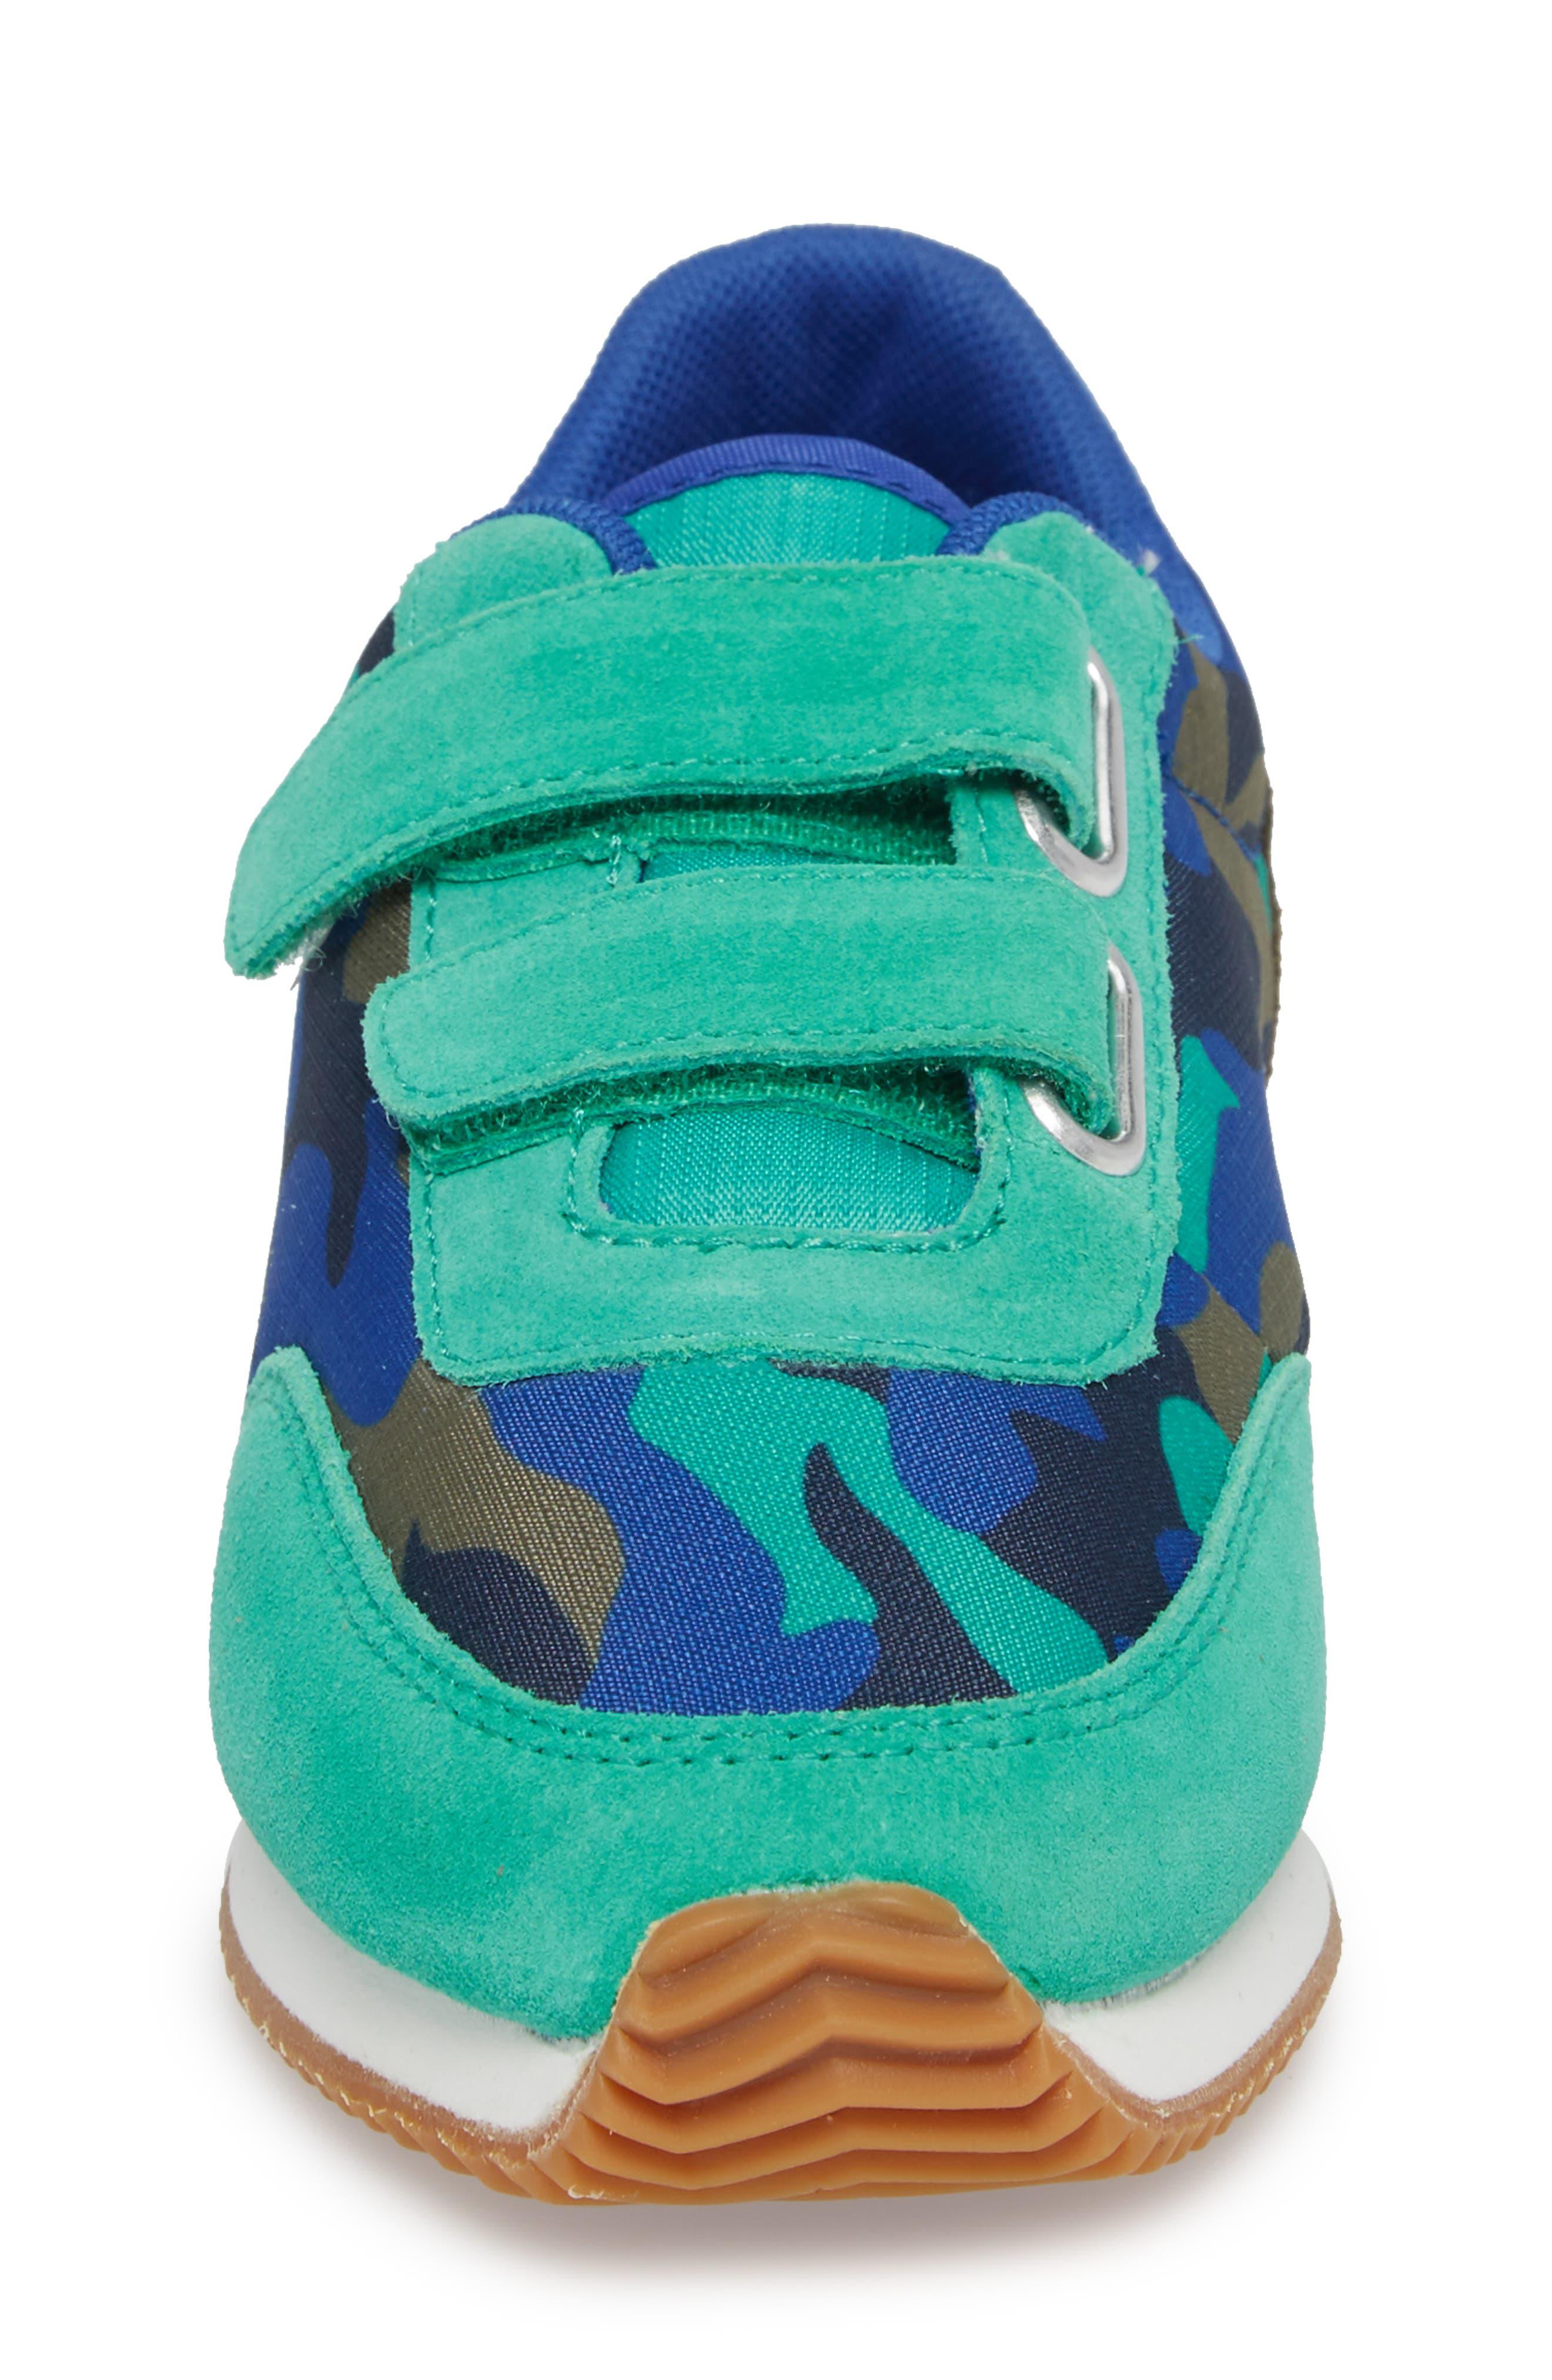 Print Sneakers,                             Alternate thumbnail 4, color,                             Astro Green